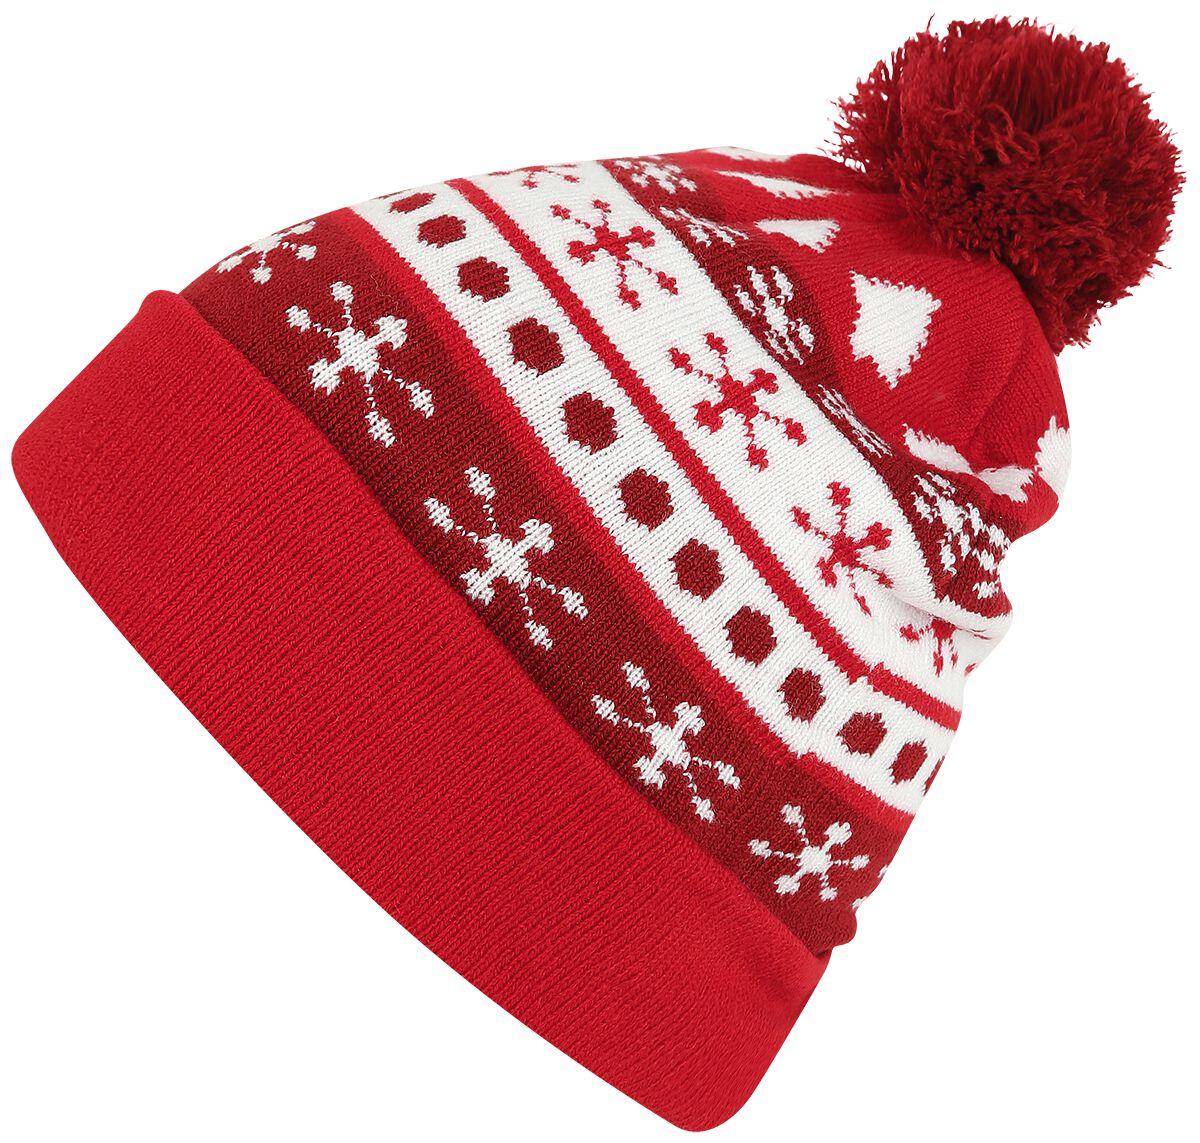 Image of   Urban Classics Christmas Beanie Beanie rød-hvid